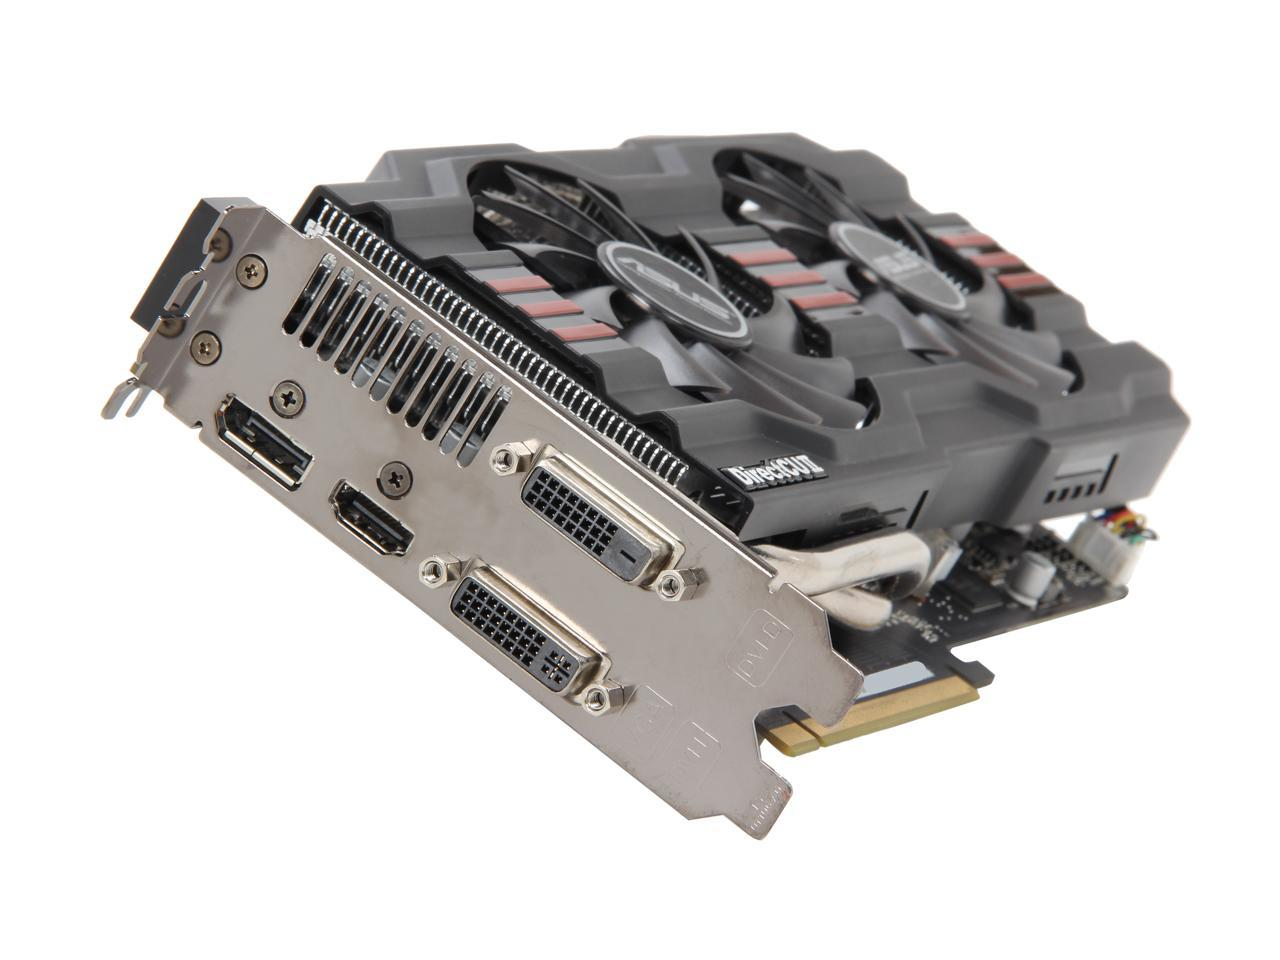 Asus Radeon Hd 7870 Ghz Edition Directx 11 Hd7870 Dc2 2gd5 V2 Video Card Newegg Com